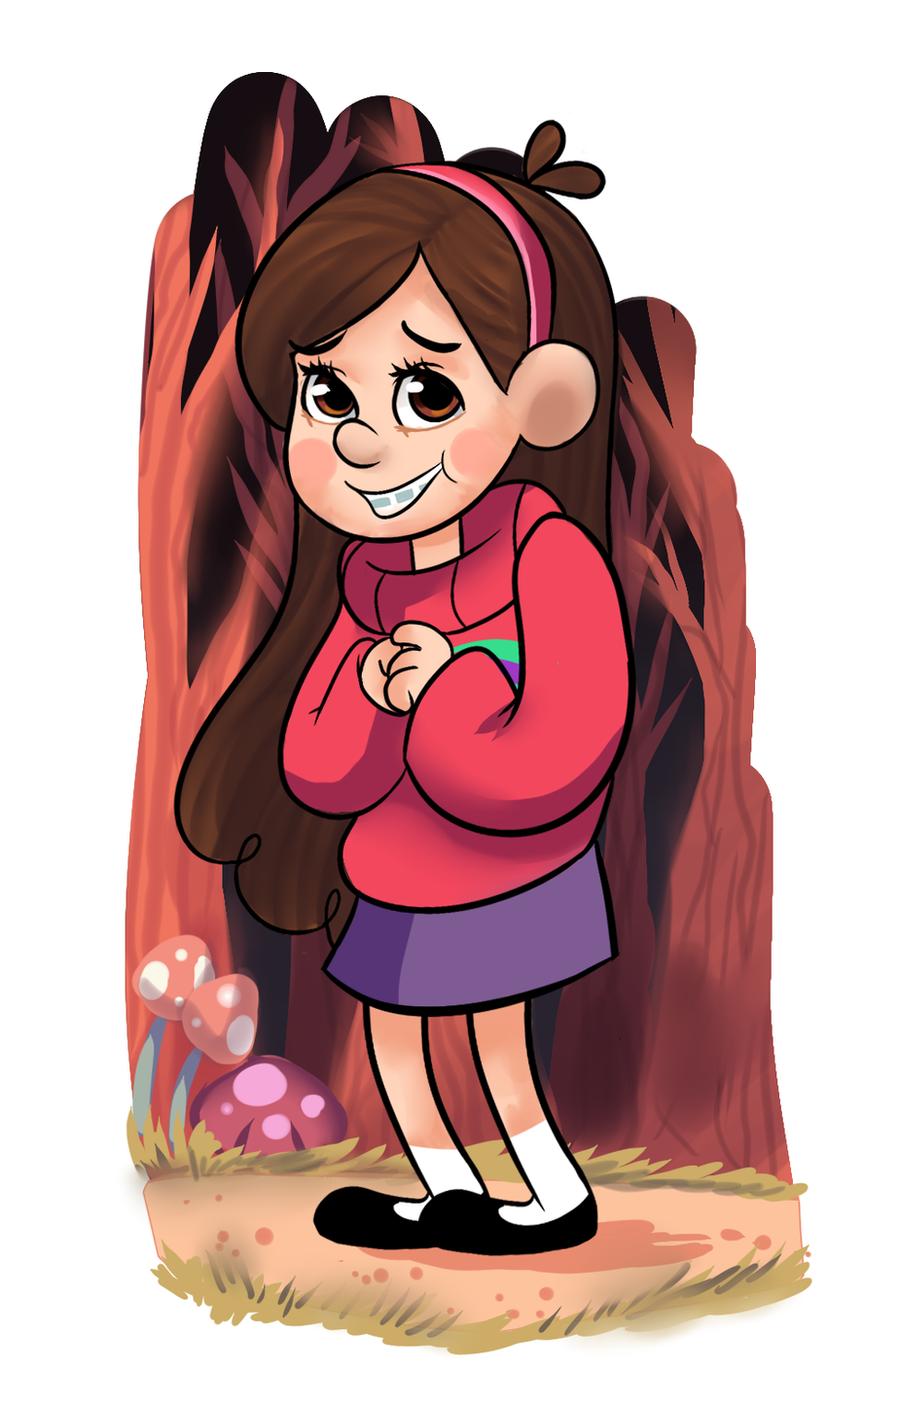 Gravity Falls: Mabel Pines by AninhaT-T